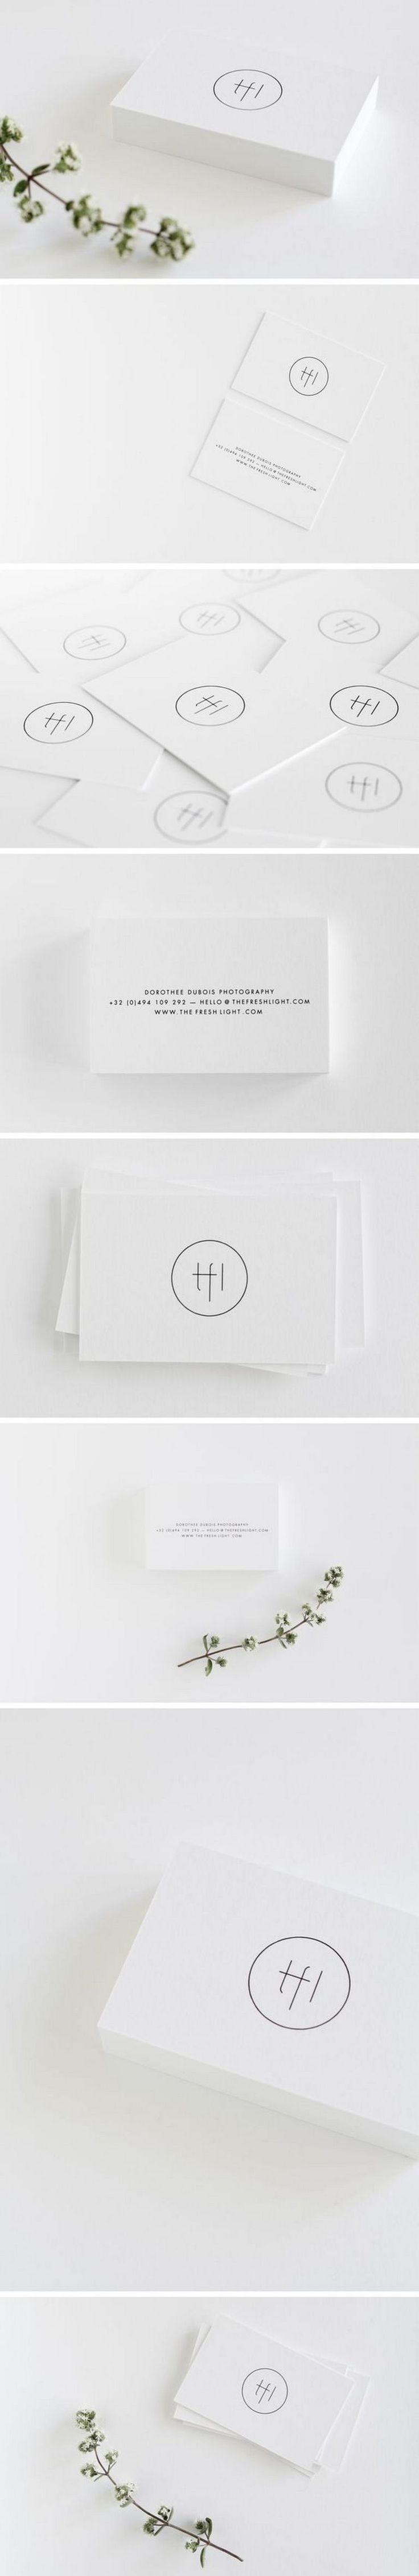 80+ Good Sample of Line Graphic Design Ideas